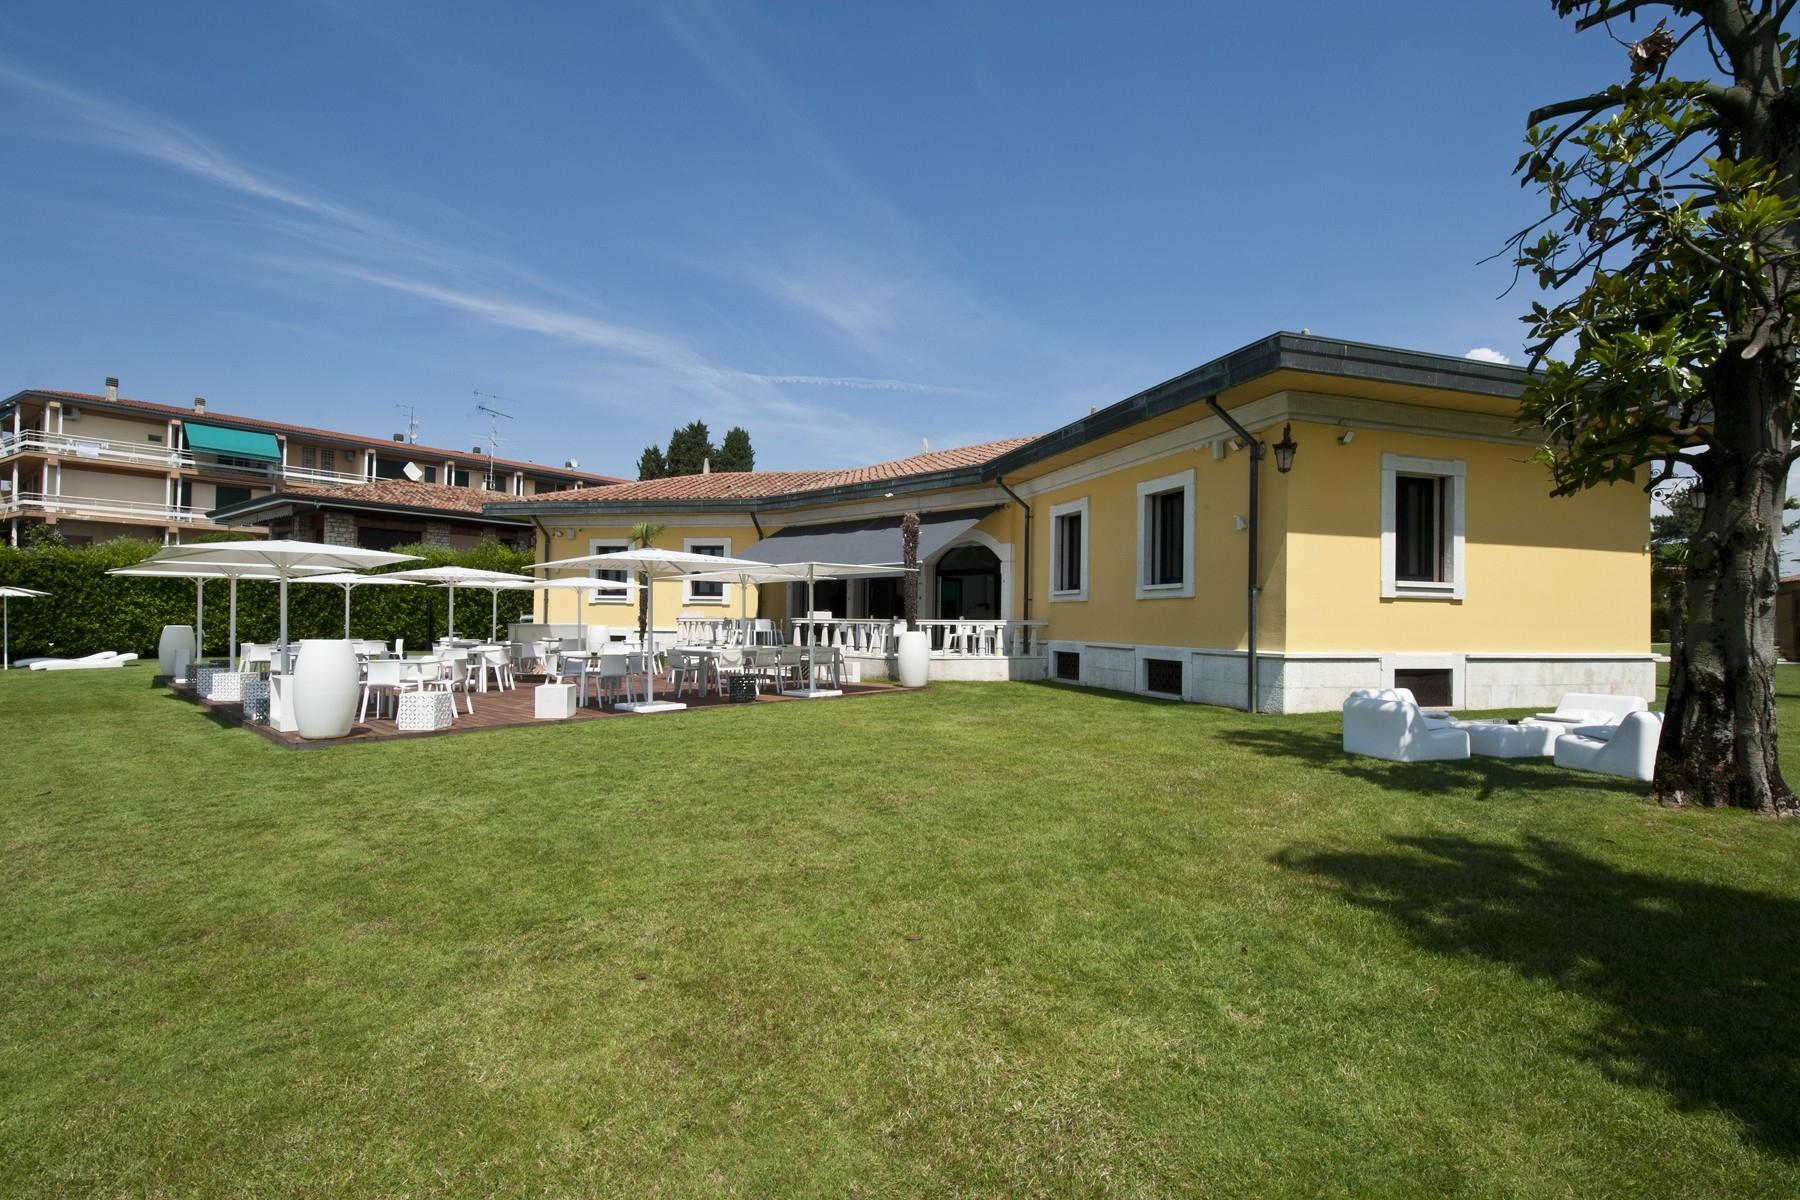 Villa in Vendita a Sirmione: 5 locali, 550 mq - Foto 8